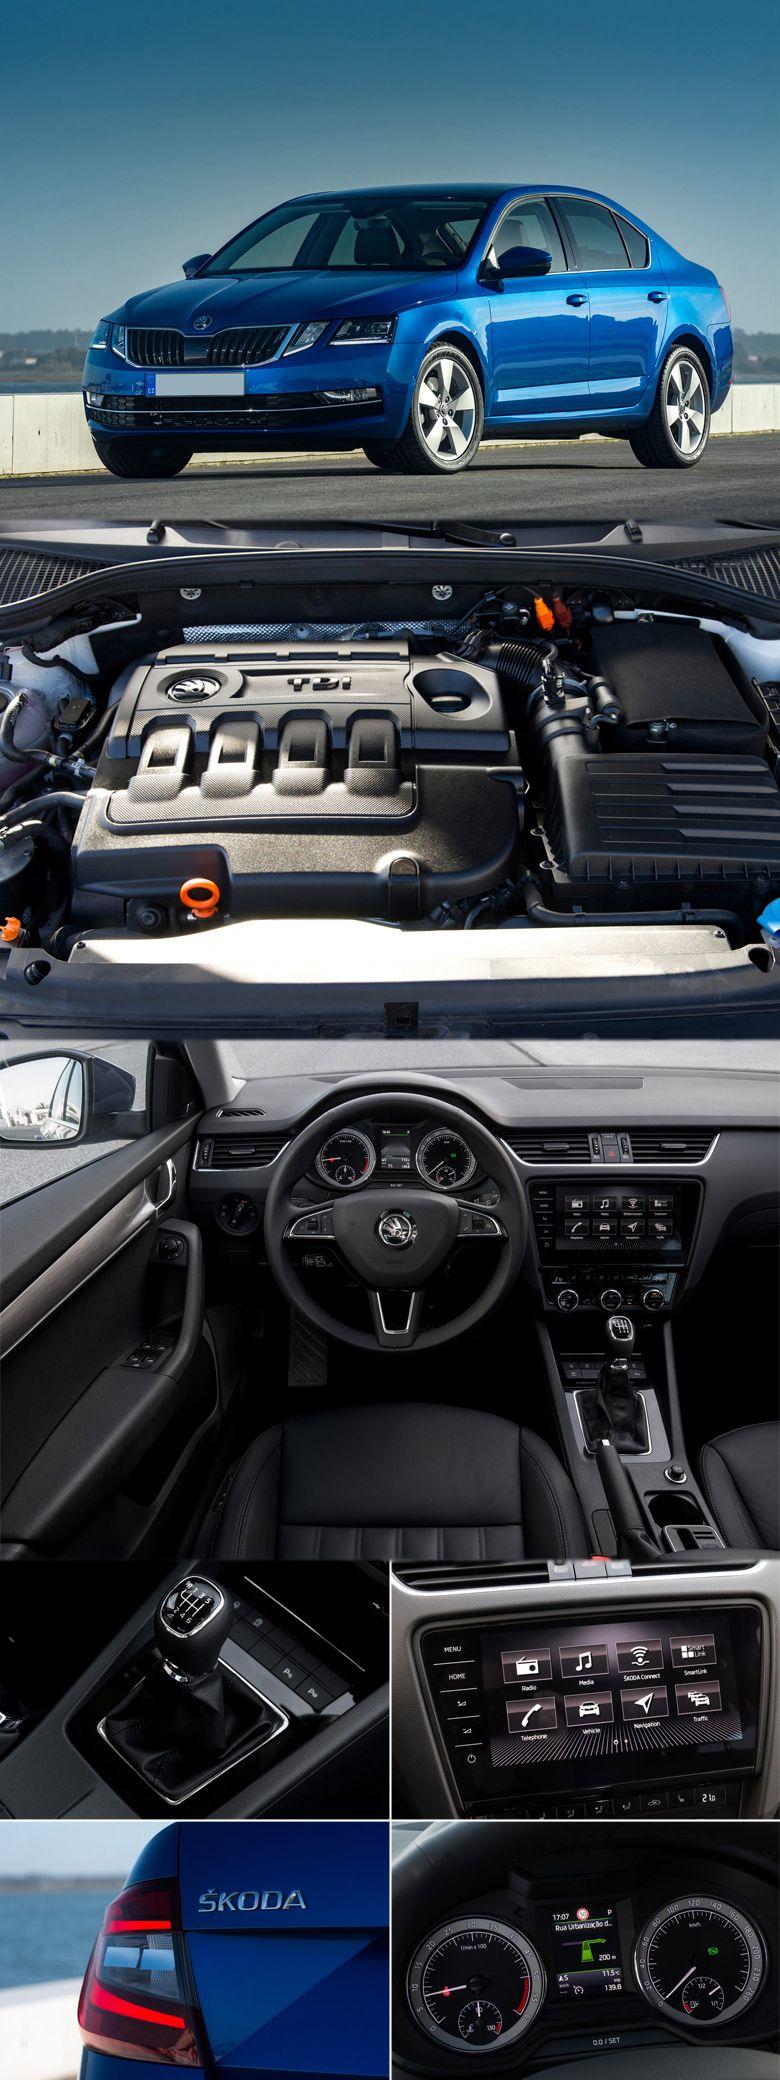 Category Skoda >> Skoda Octavia New Design And Range Of Engines Https Www